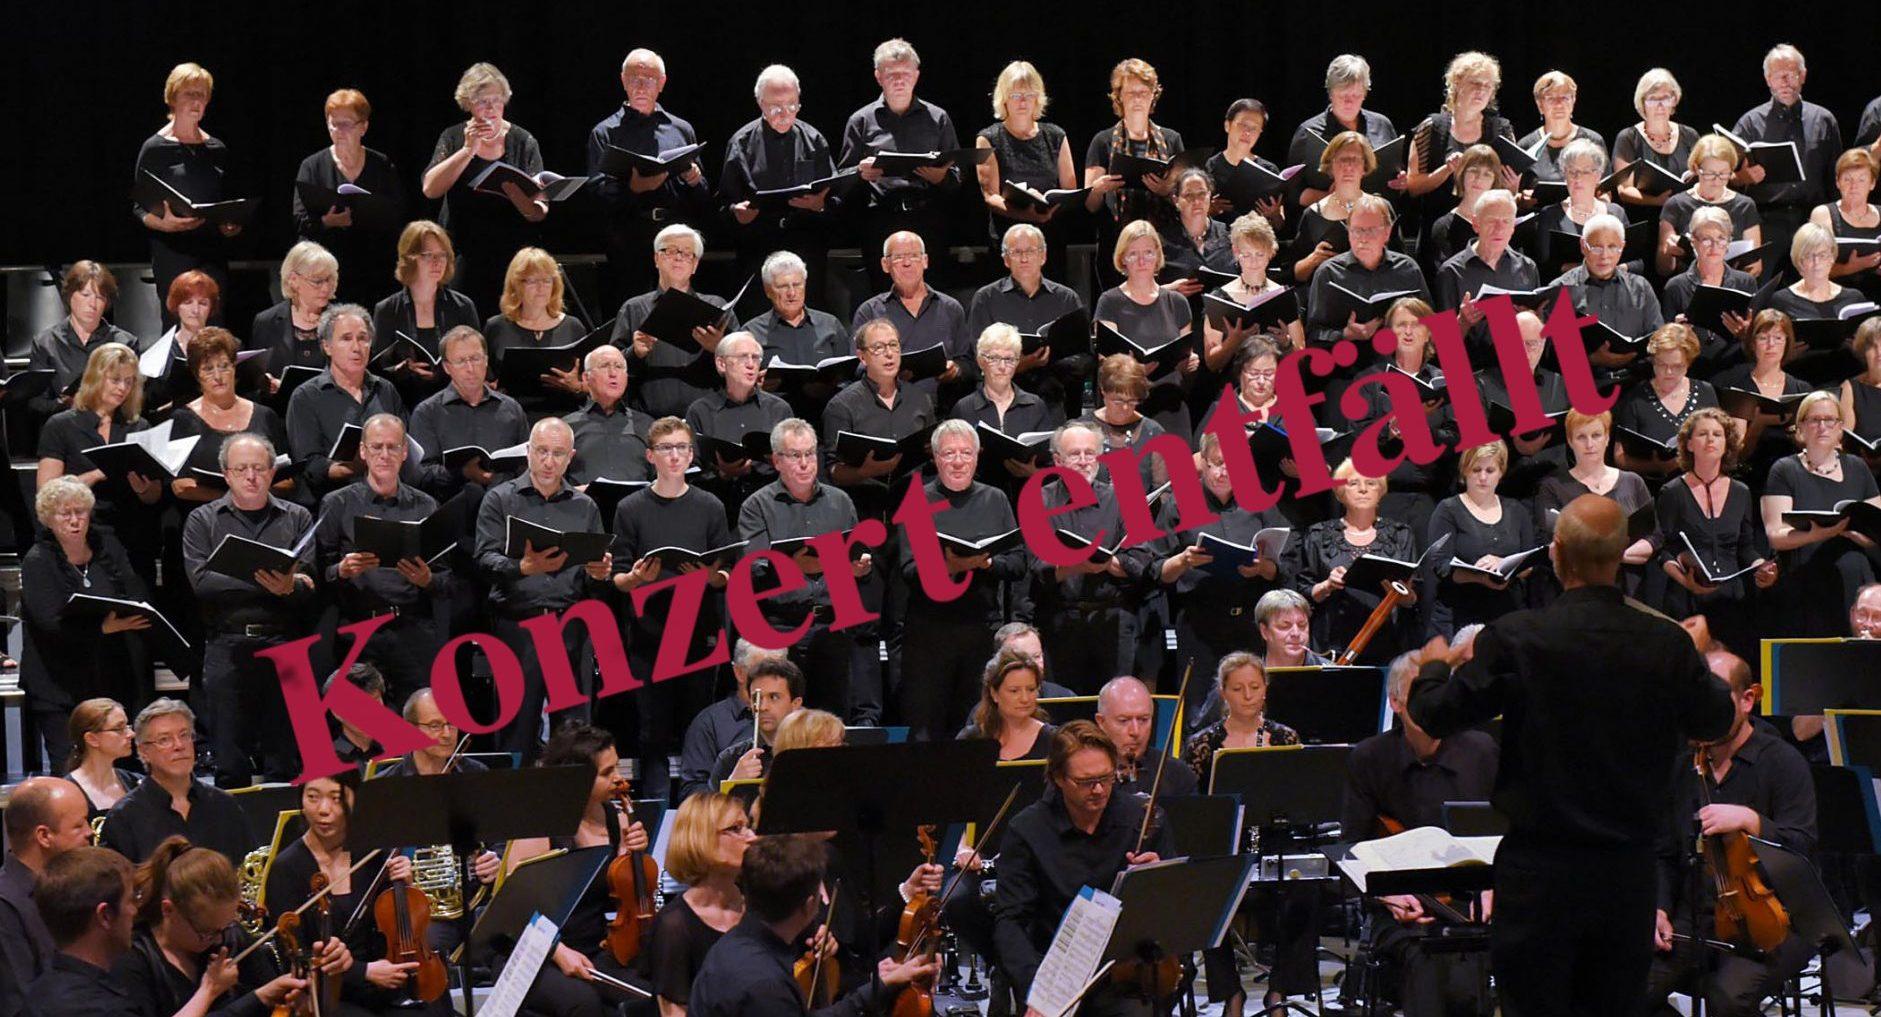 Highlights der Proms 2021 – das Konzert fällt aus!